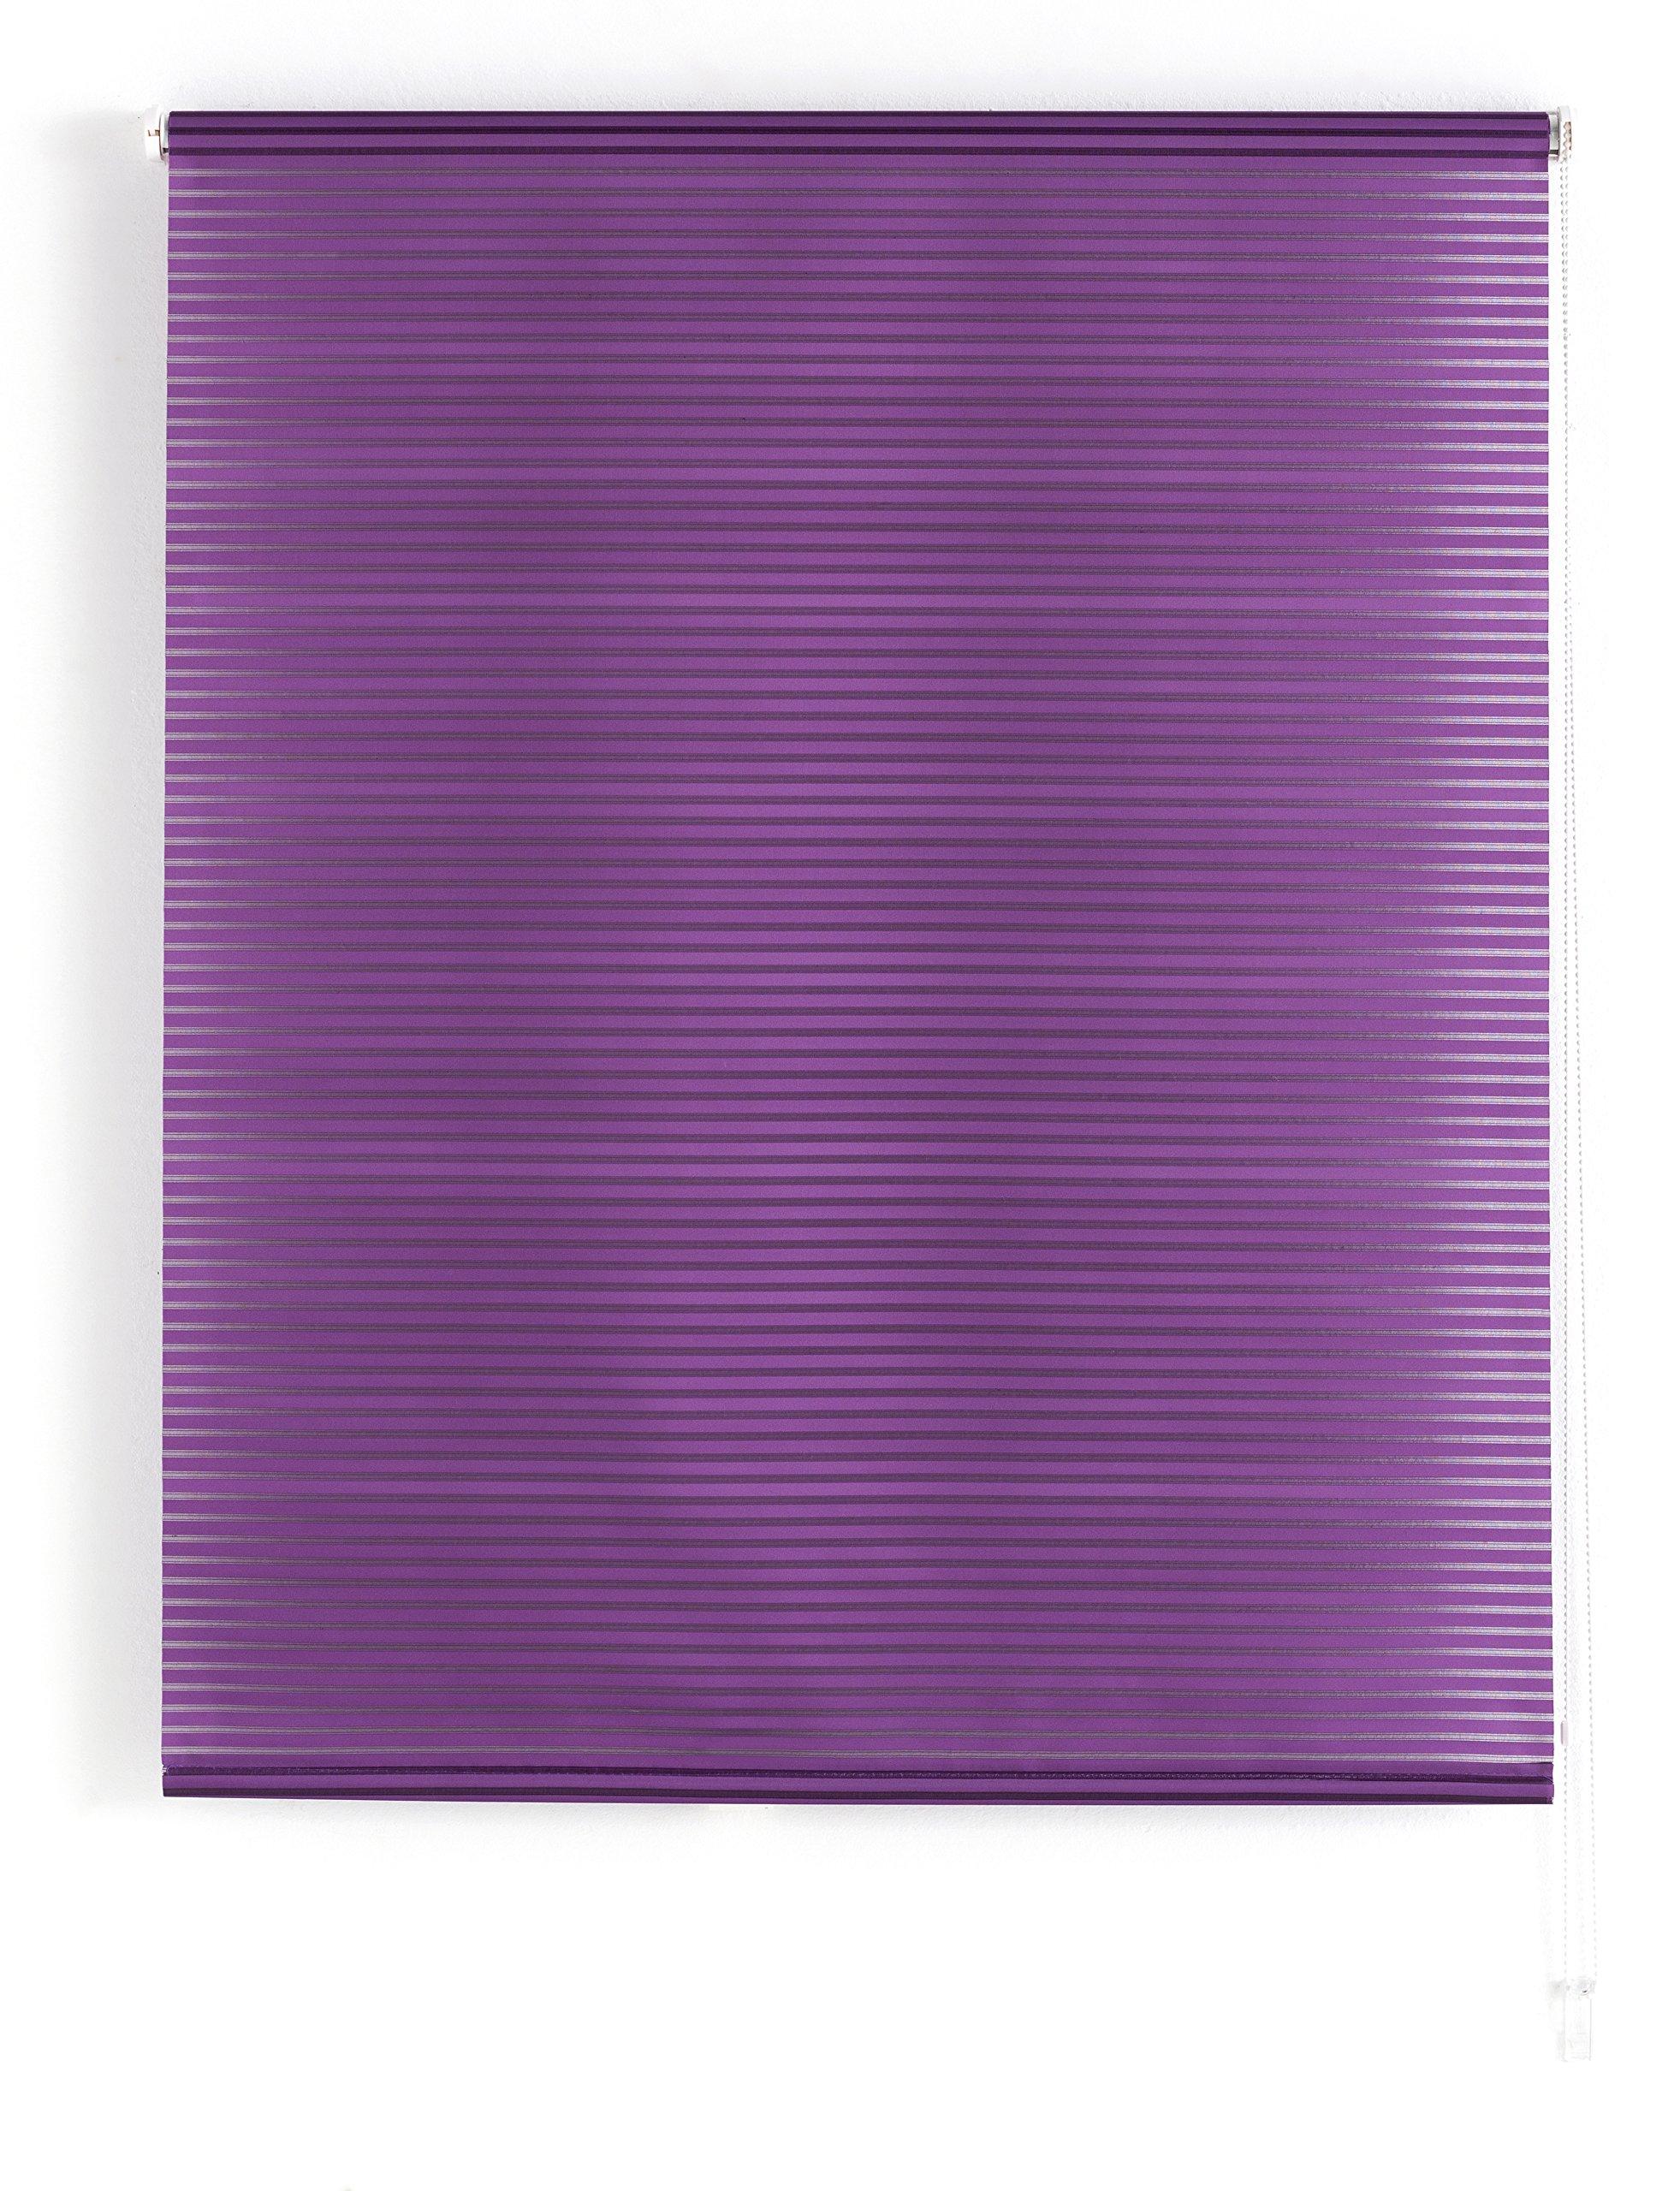 Blindecor Iris Estor Enrollable Translucido Rayado, Tela, Violeta, 160 x 180 cm product